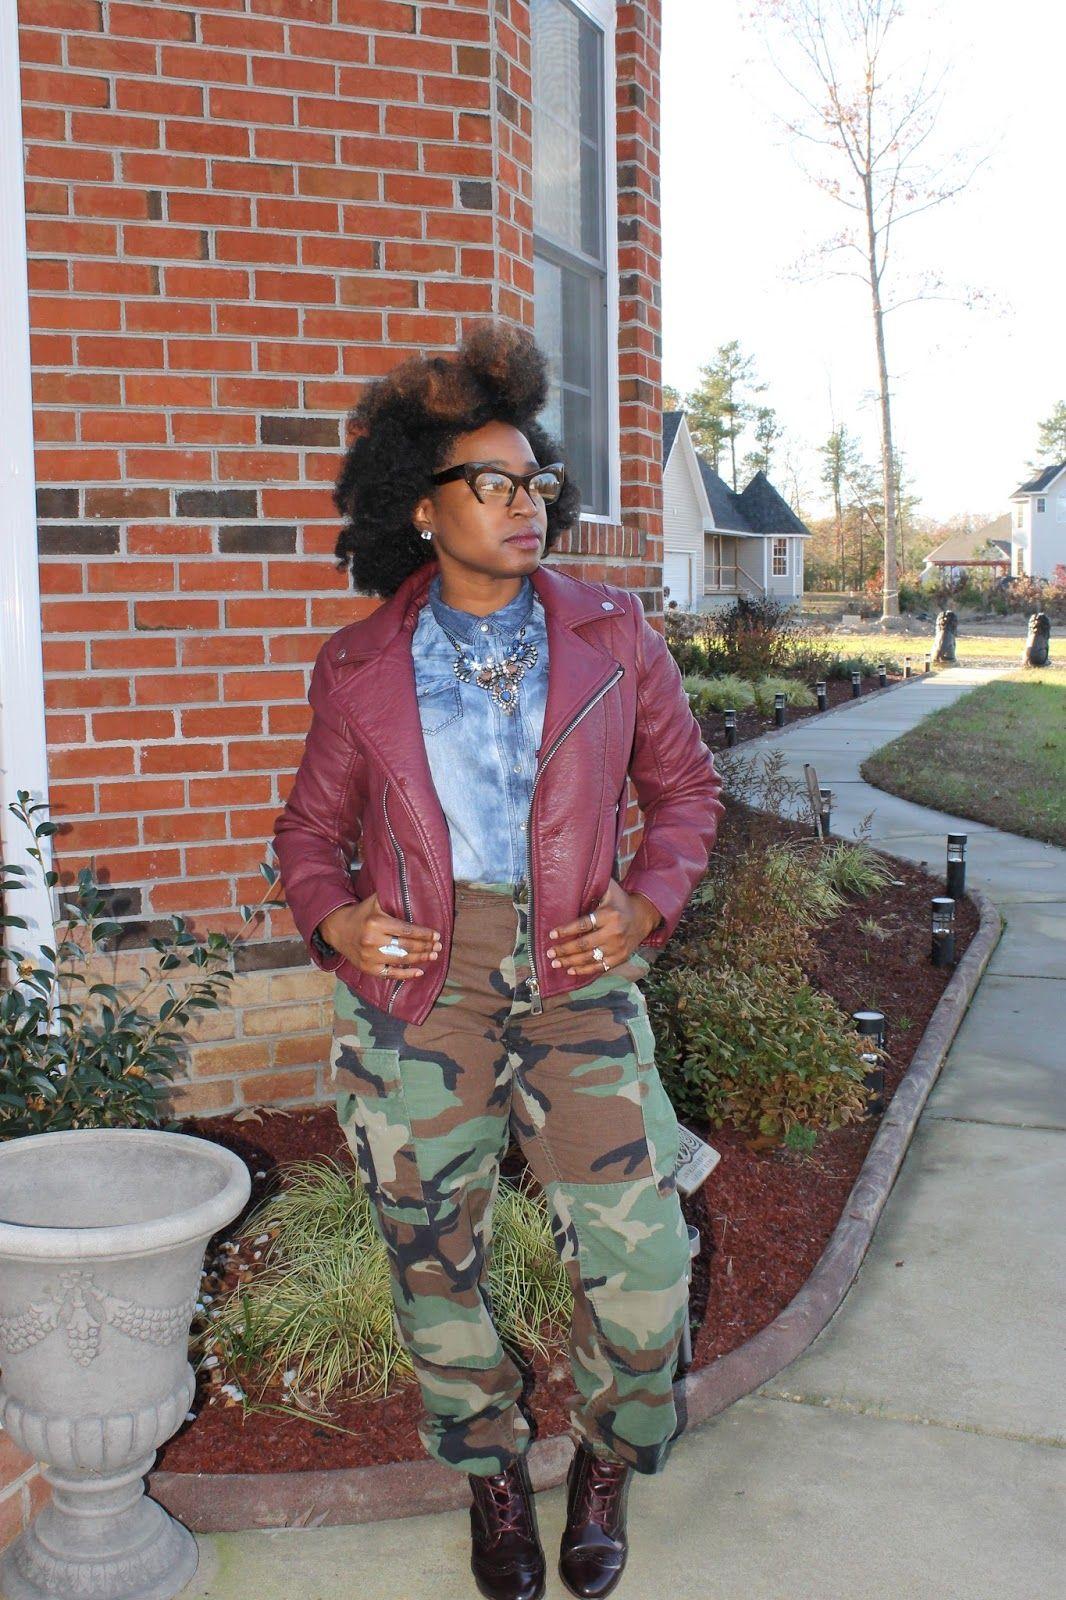 Atlanta style blogger, style blogger, Atlanta blogger, natural girls killing it, street style, Moto Jacket, Fatigue Pants